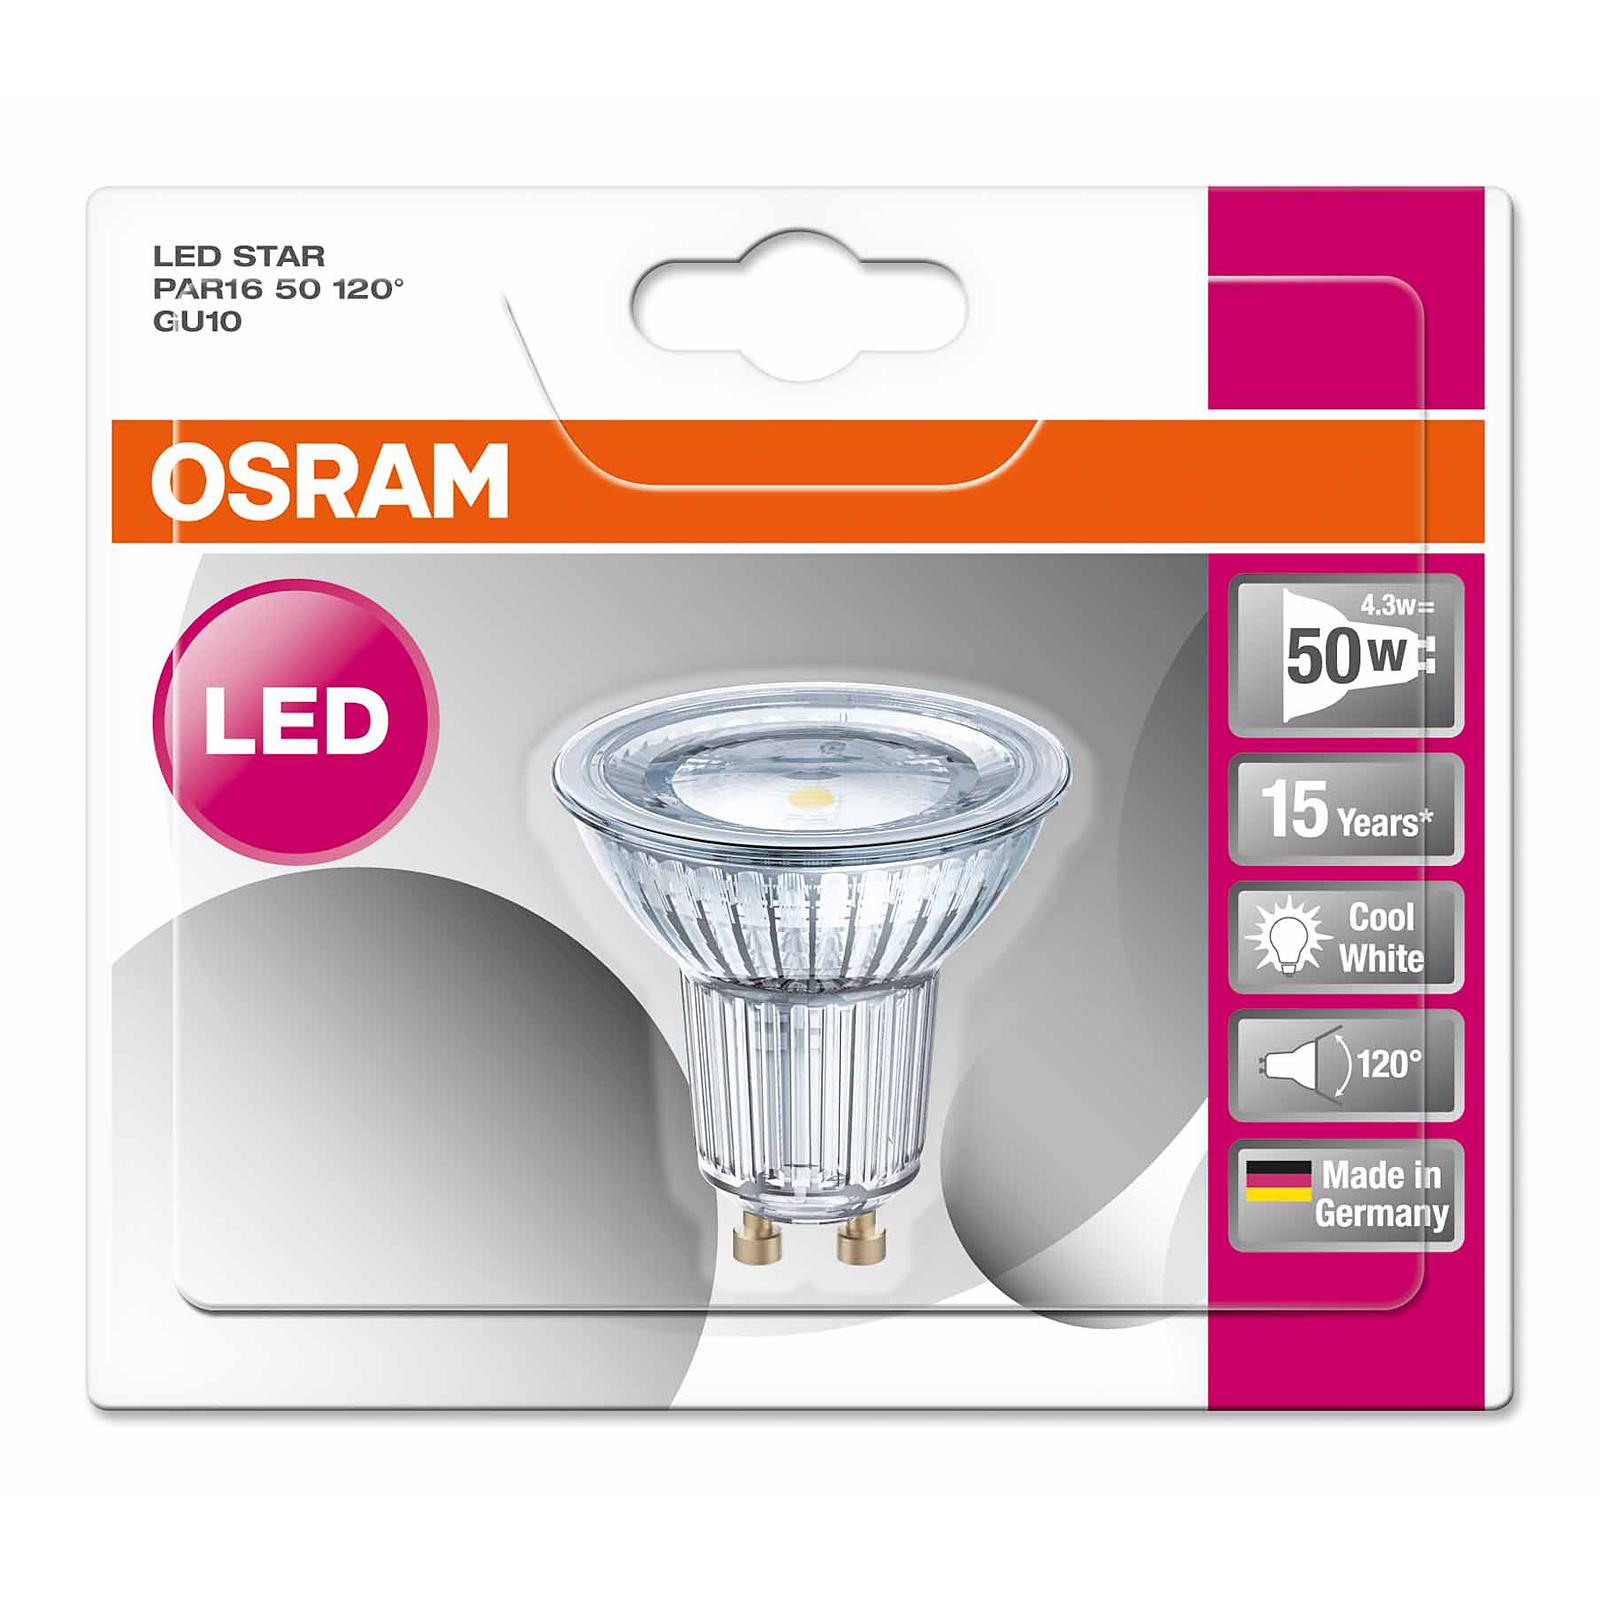 osram led star par16 50 120 gu10 4 3 watt wie 50 watt 330 lm neutral white ebay. Black Bedroom Furniture Sets. Home Design Ideas